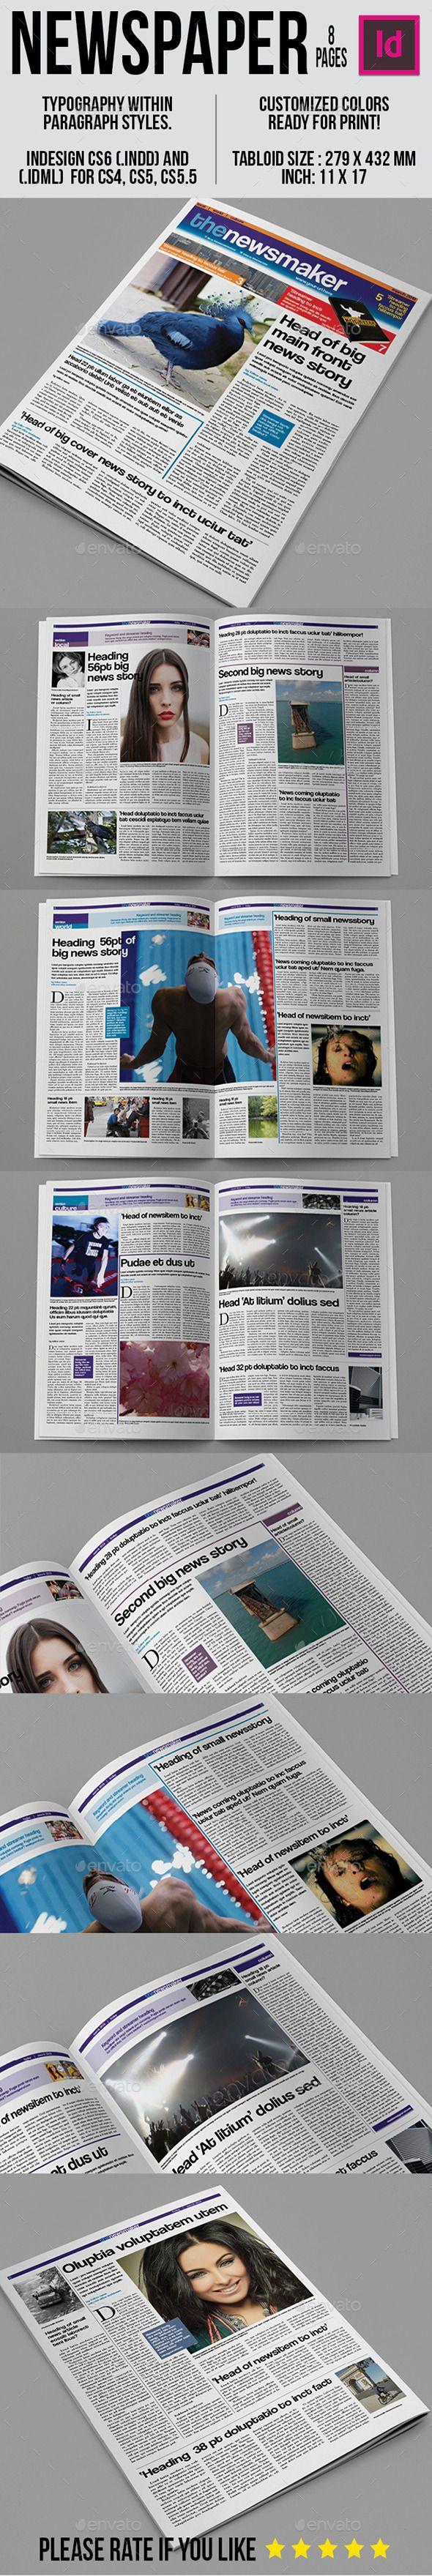 Tabloid Newspaper Template   Diseño editorial y Editorial